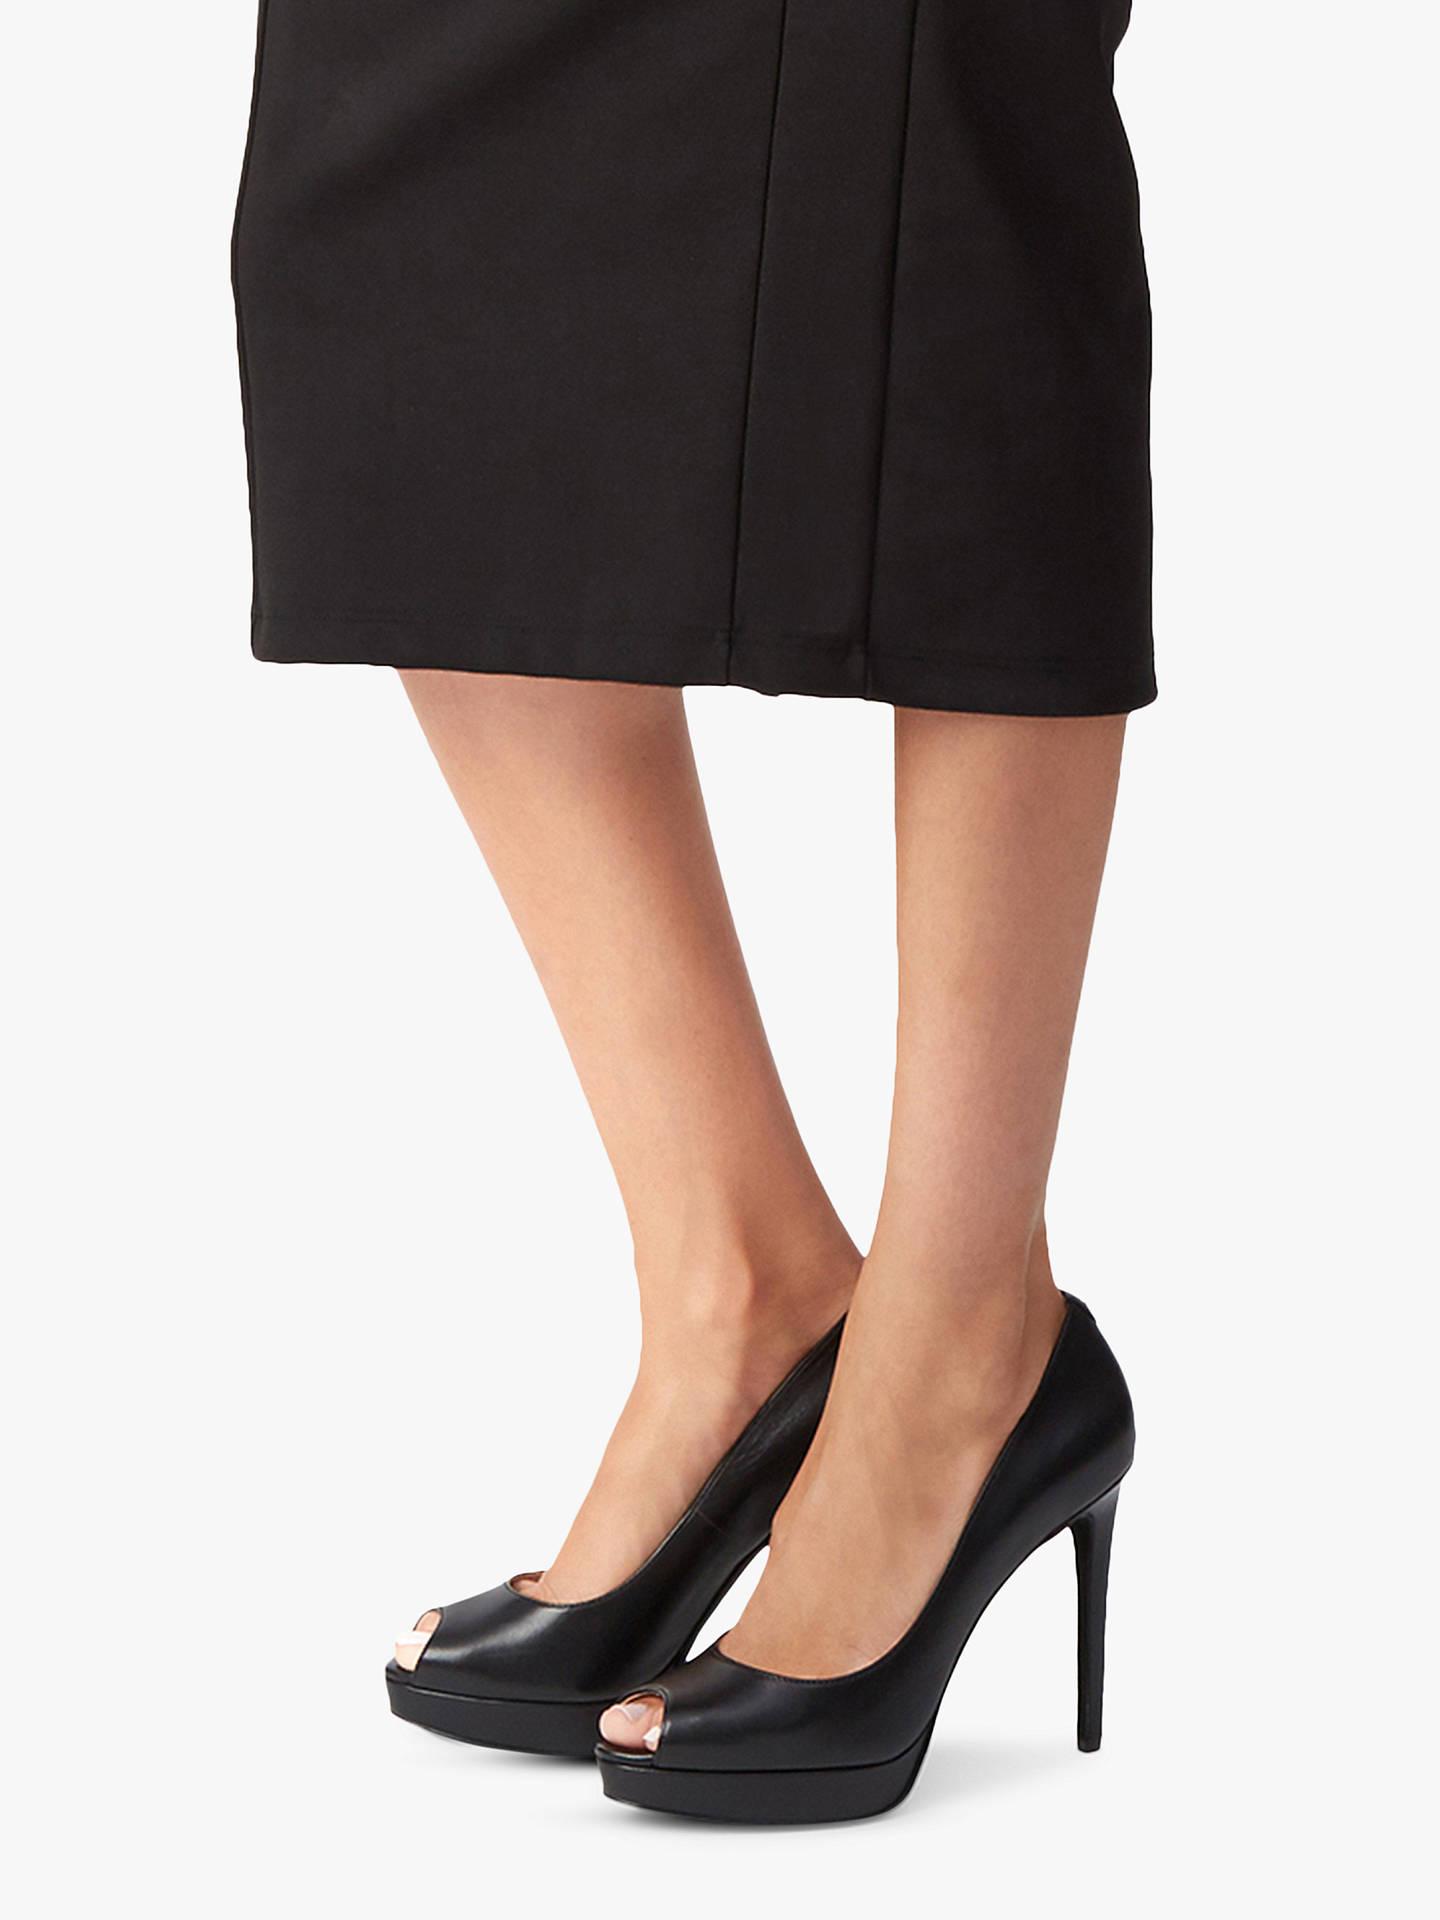 b4c057c442b5 MICHAEL Michael Kors Erika Peep Toe Stiletto Heel Sandals at John ...